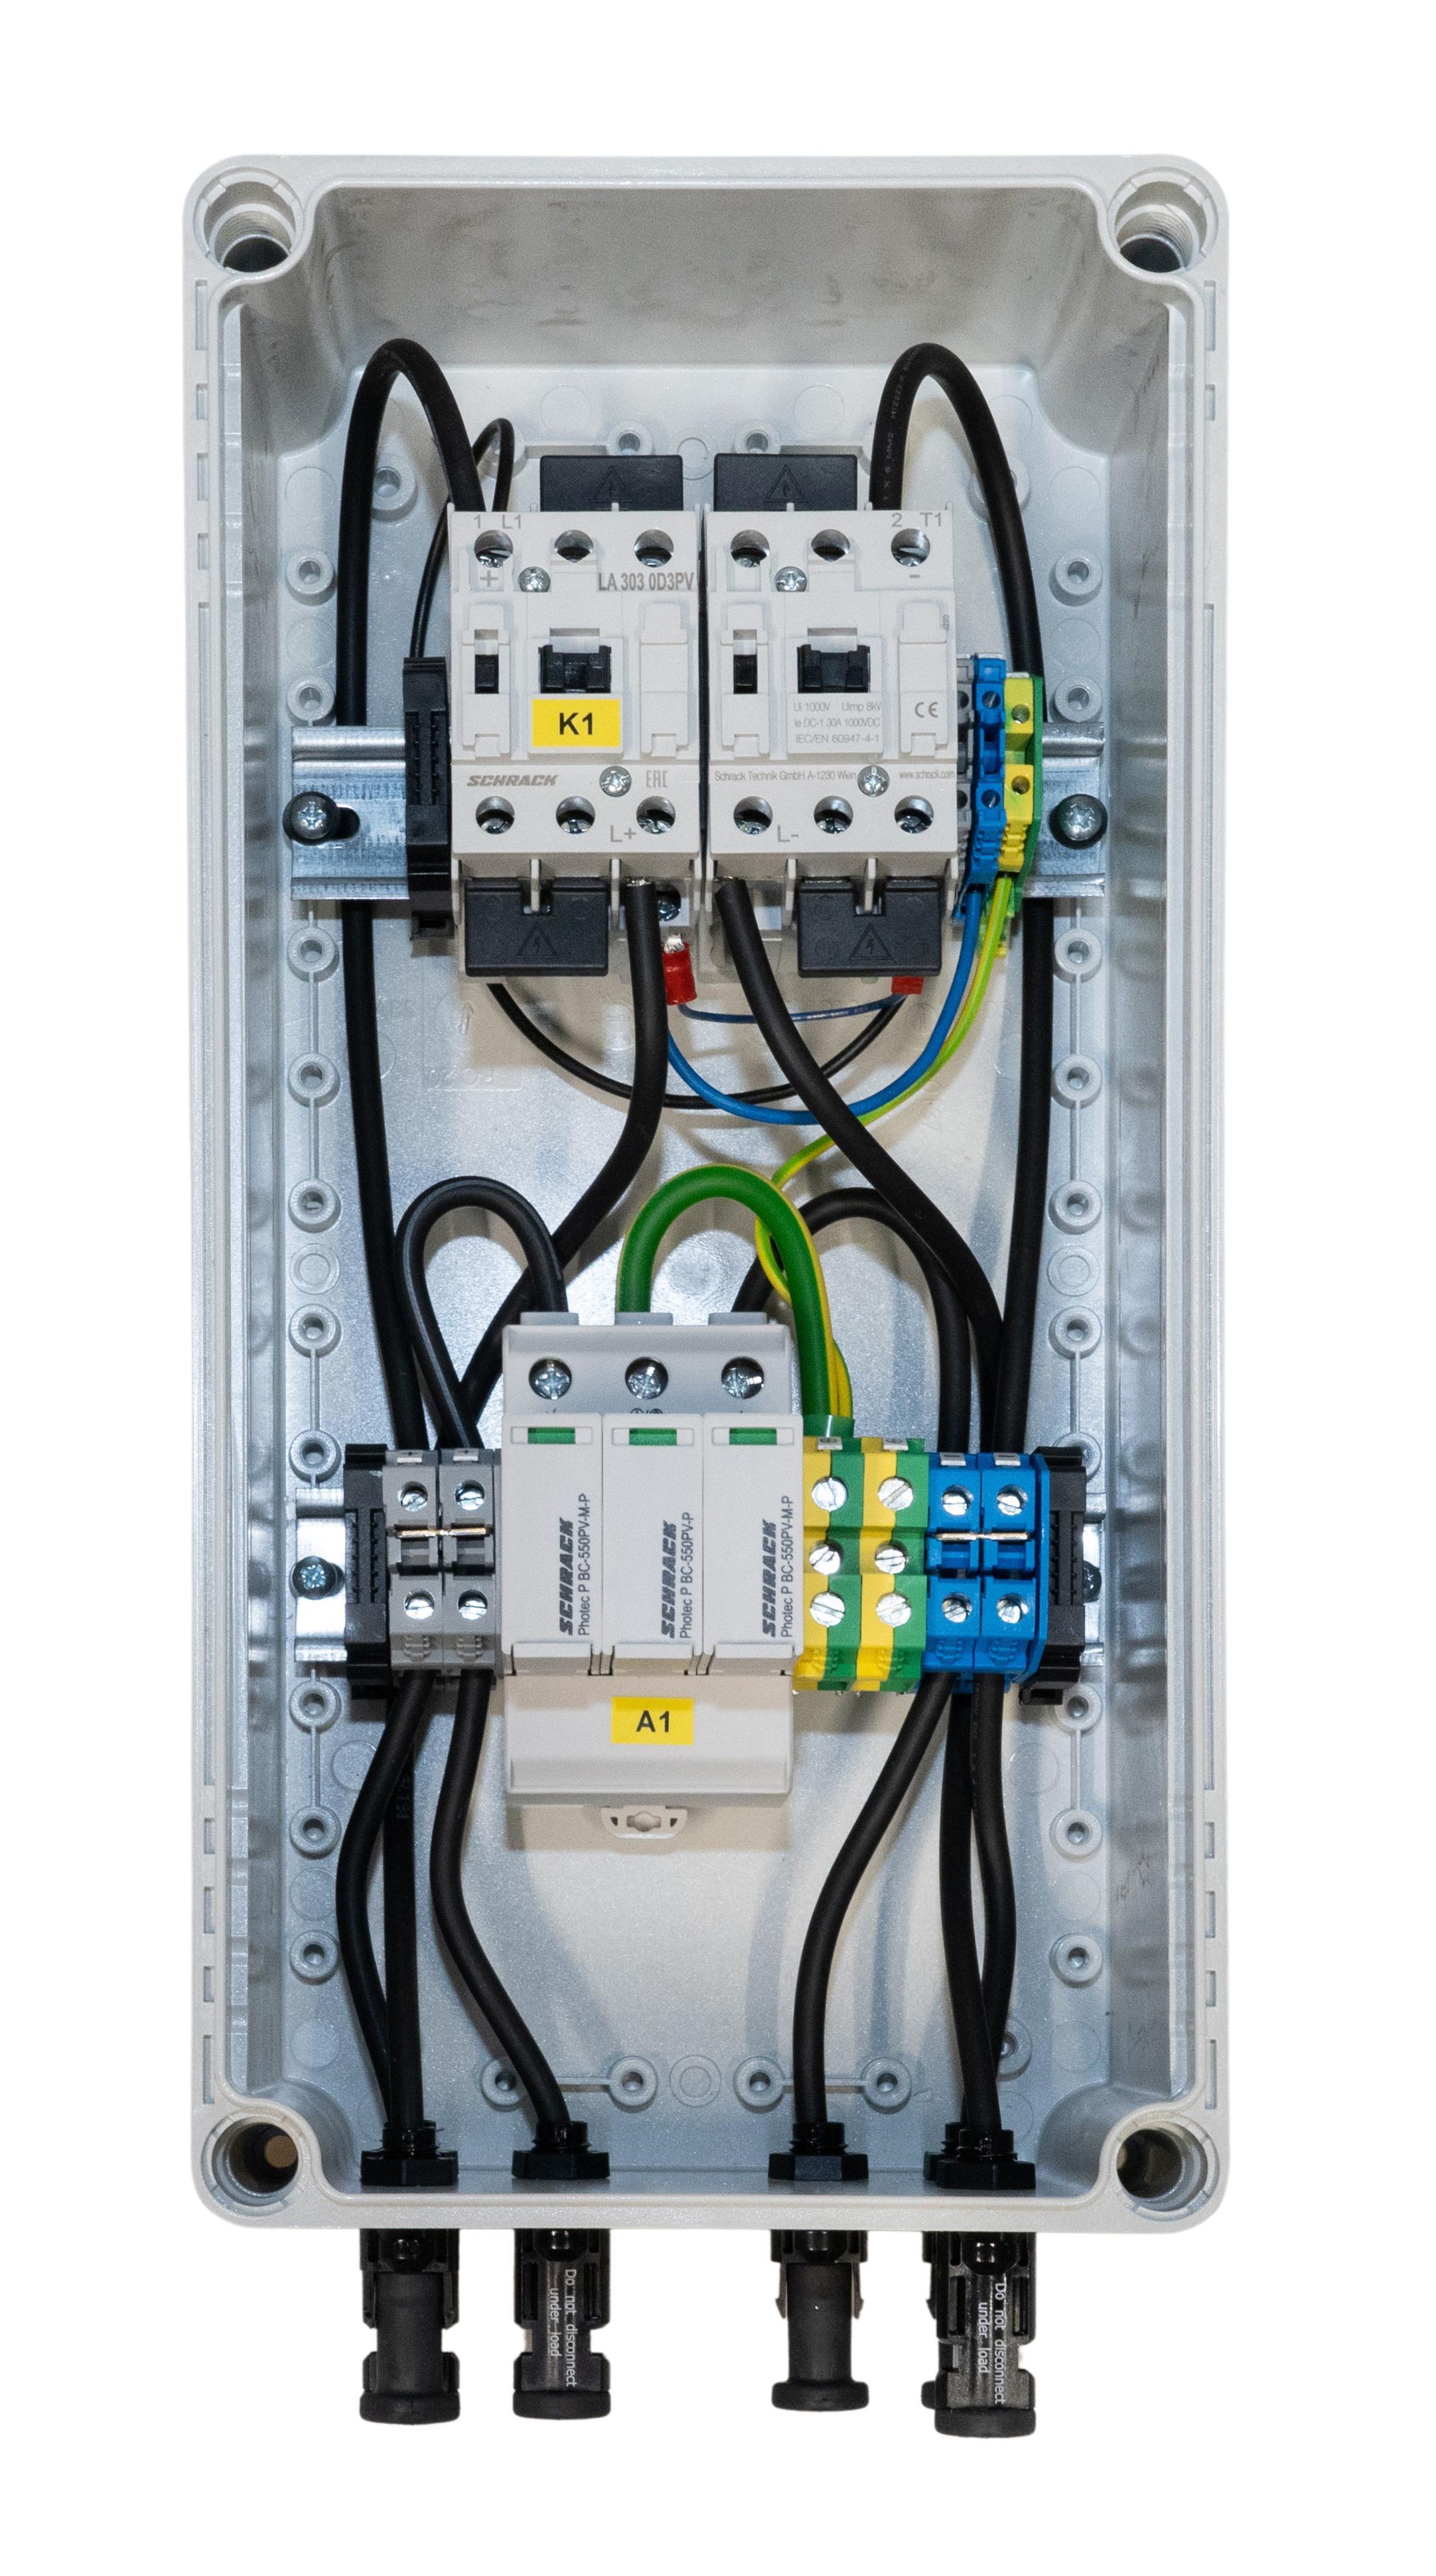 1 Stk PV-CombiBox BC Ableiter+Brandschutz, 1 Mpp Tracker, 1000Vdc PVPF1001--